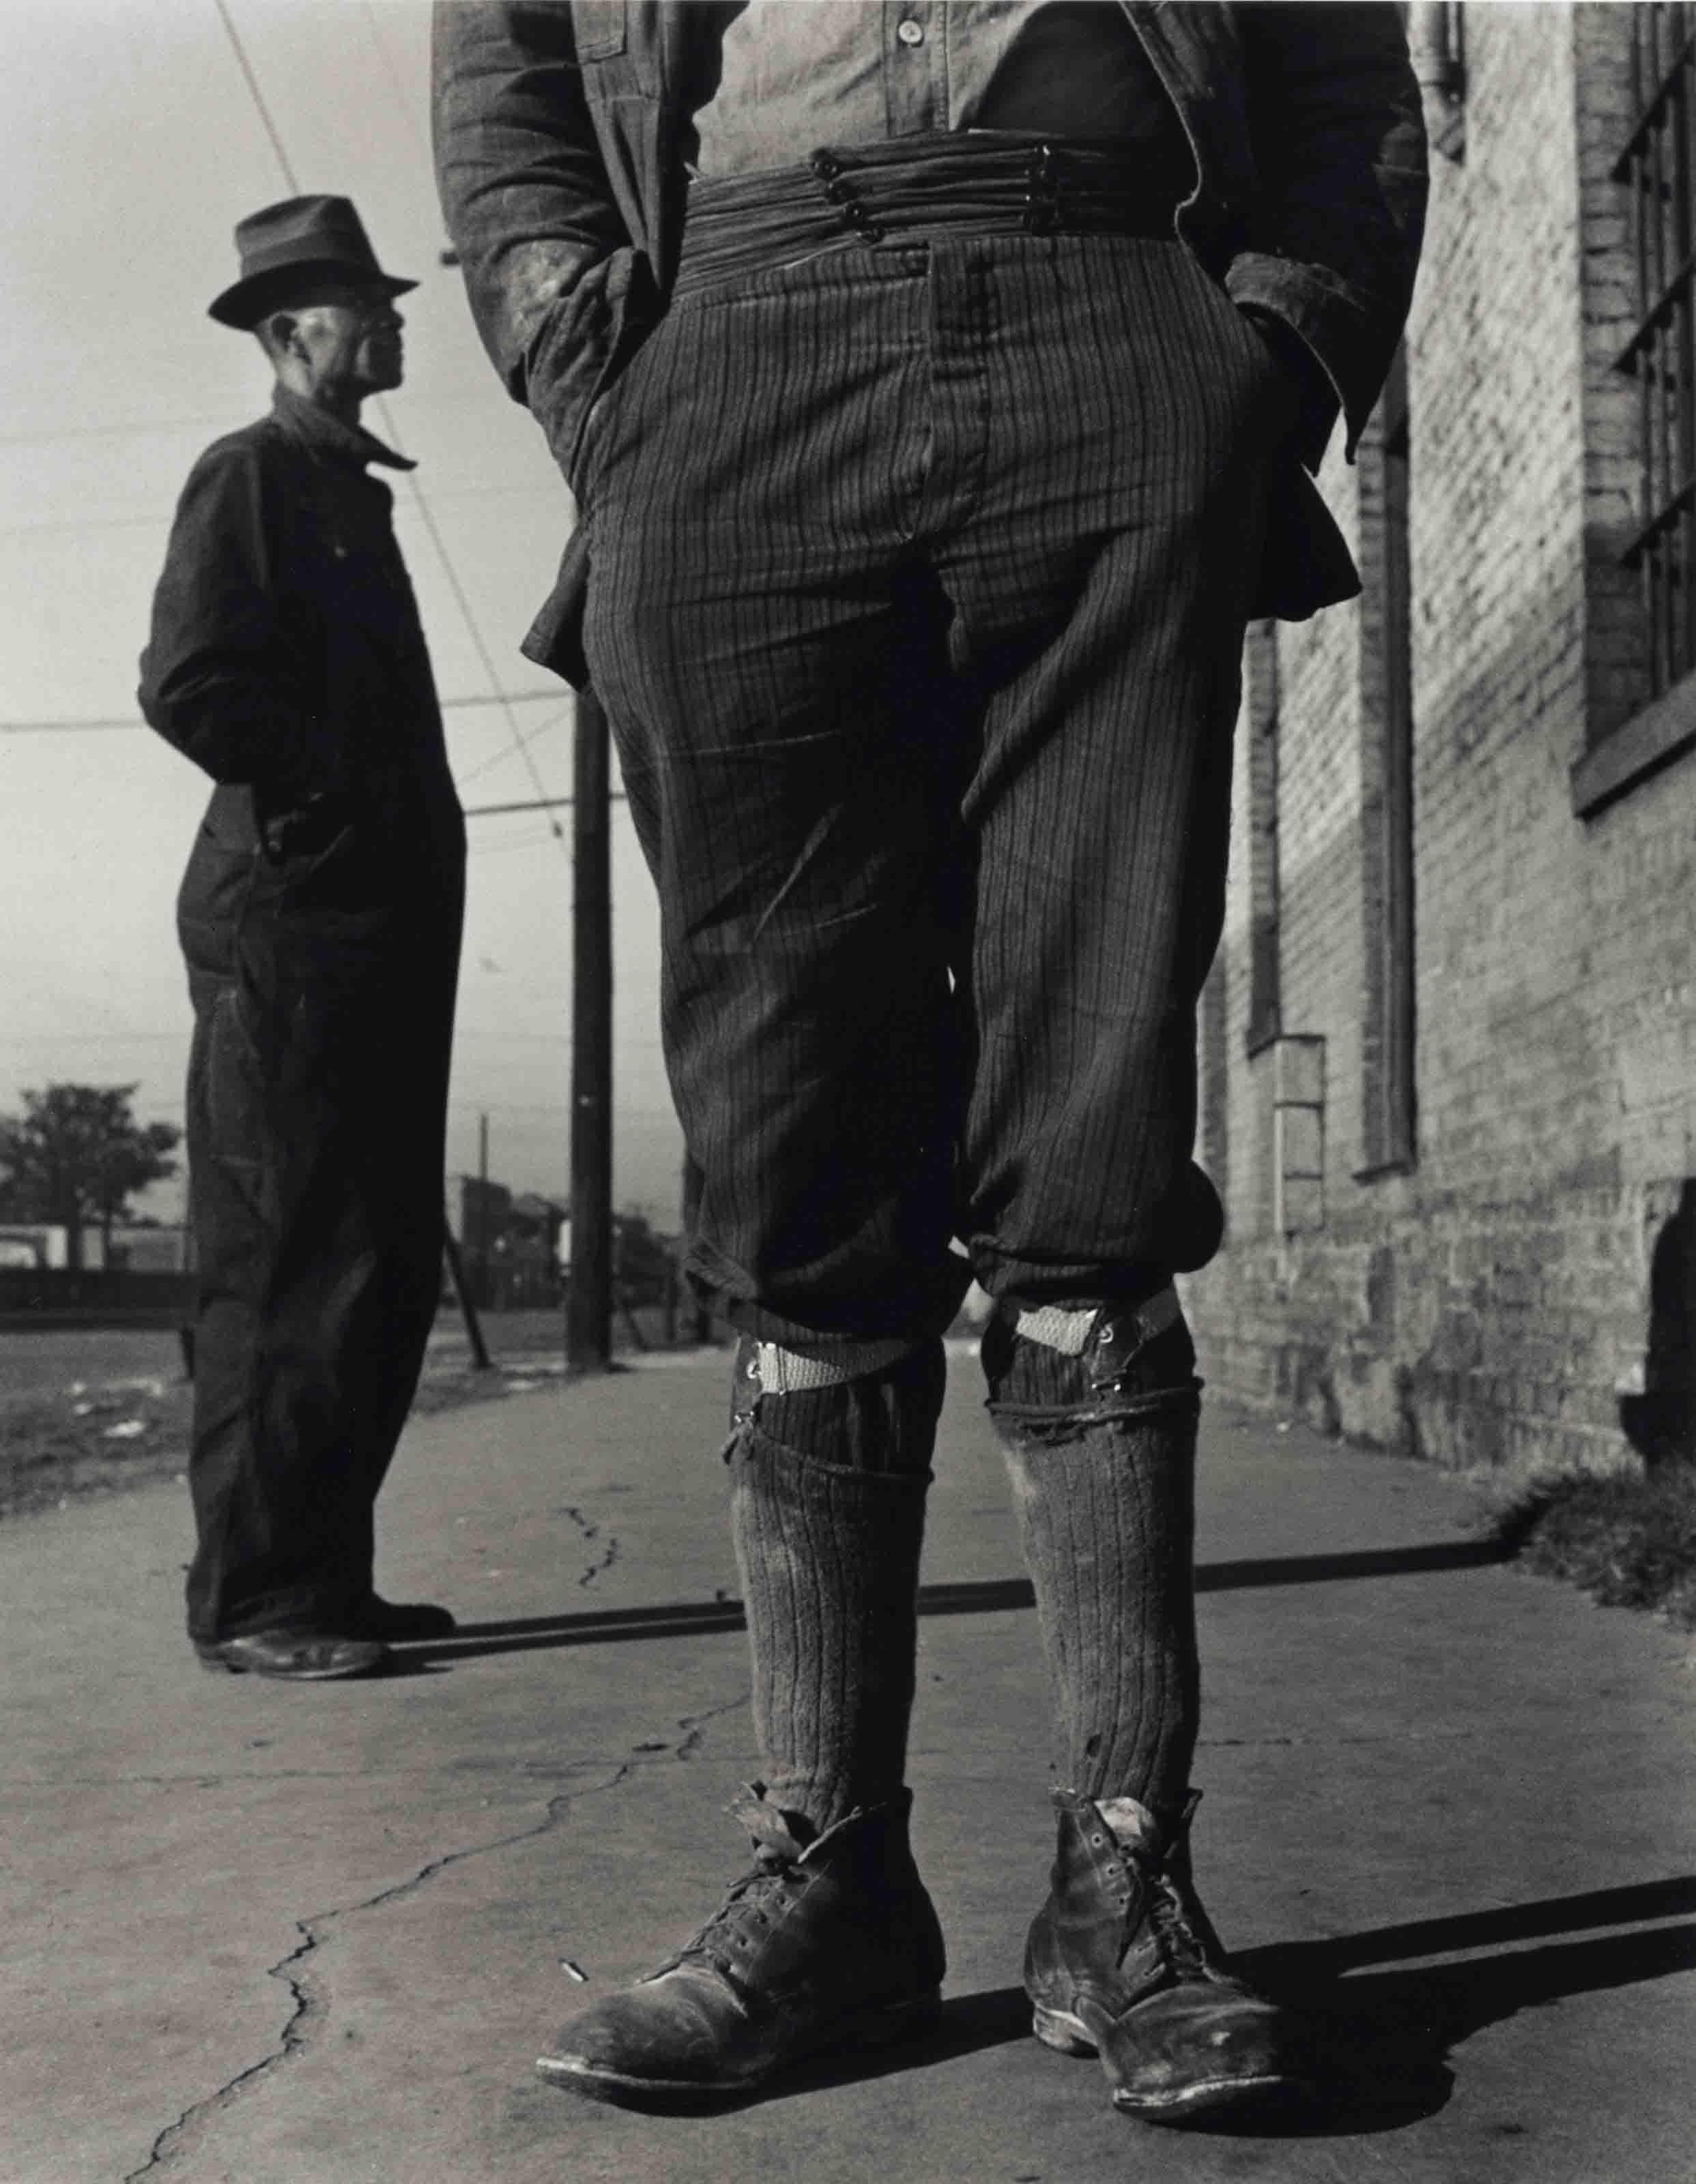 Mobile, Alabama, 1937